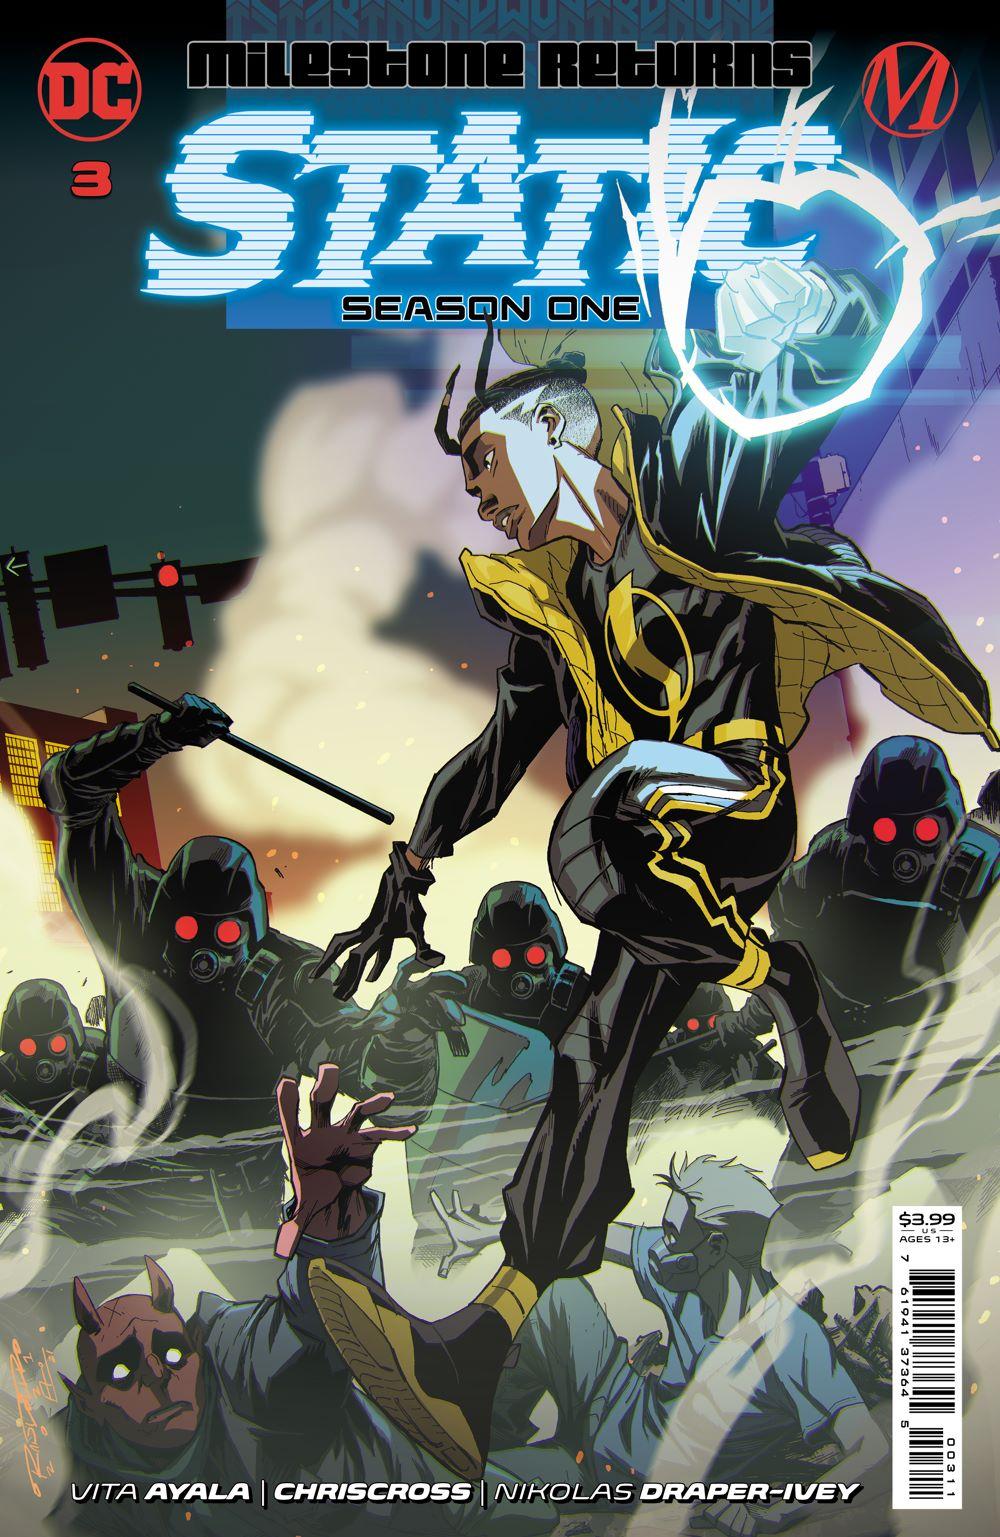 STATIC_S1_Cv3 DC Comics August 2021 Solicitations